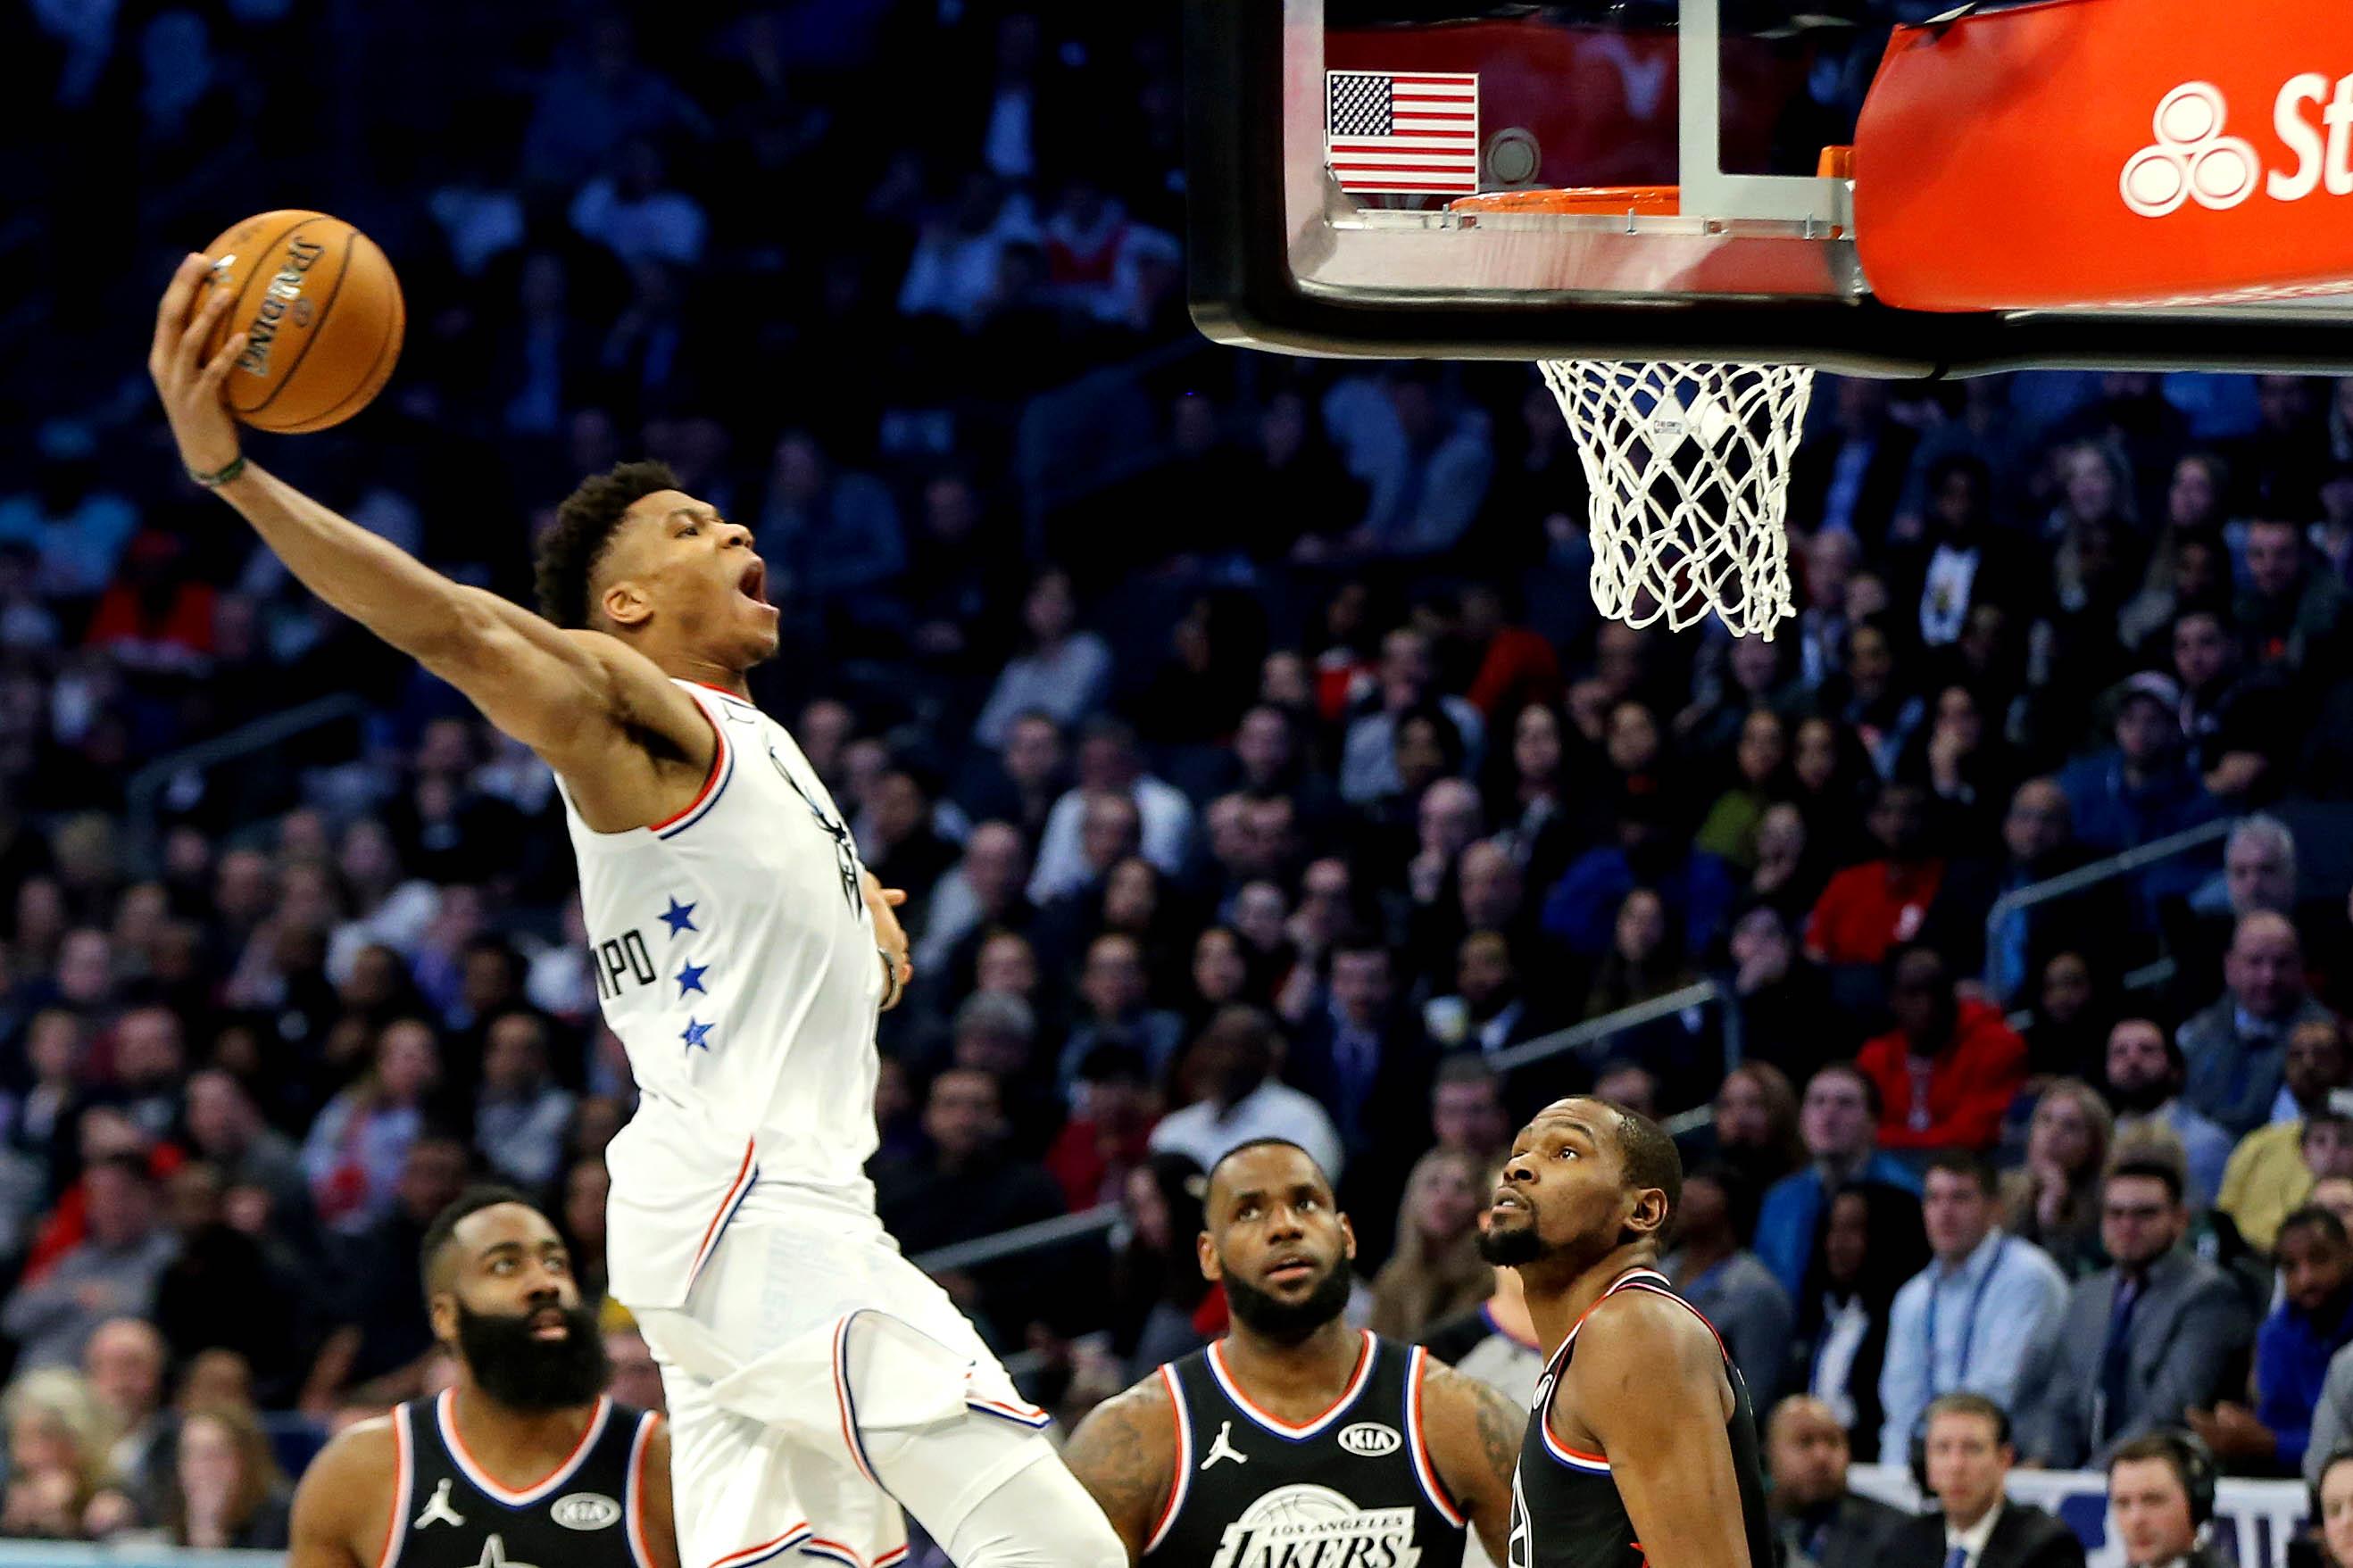 Actualite sportive : Basket - </b>NBA - Nowitzki, Antetokounmpo, James... Le Top 10 du All Star Game